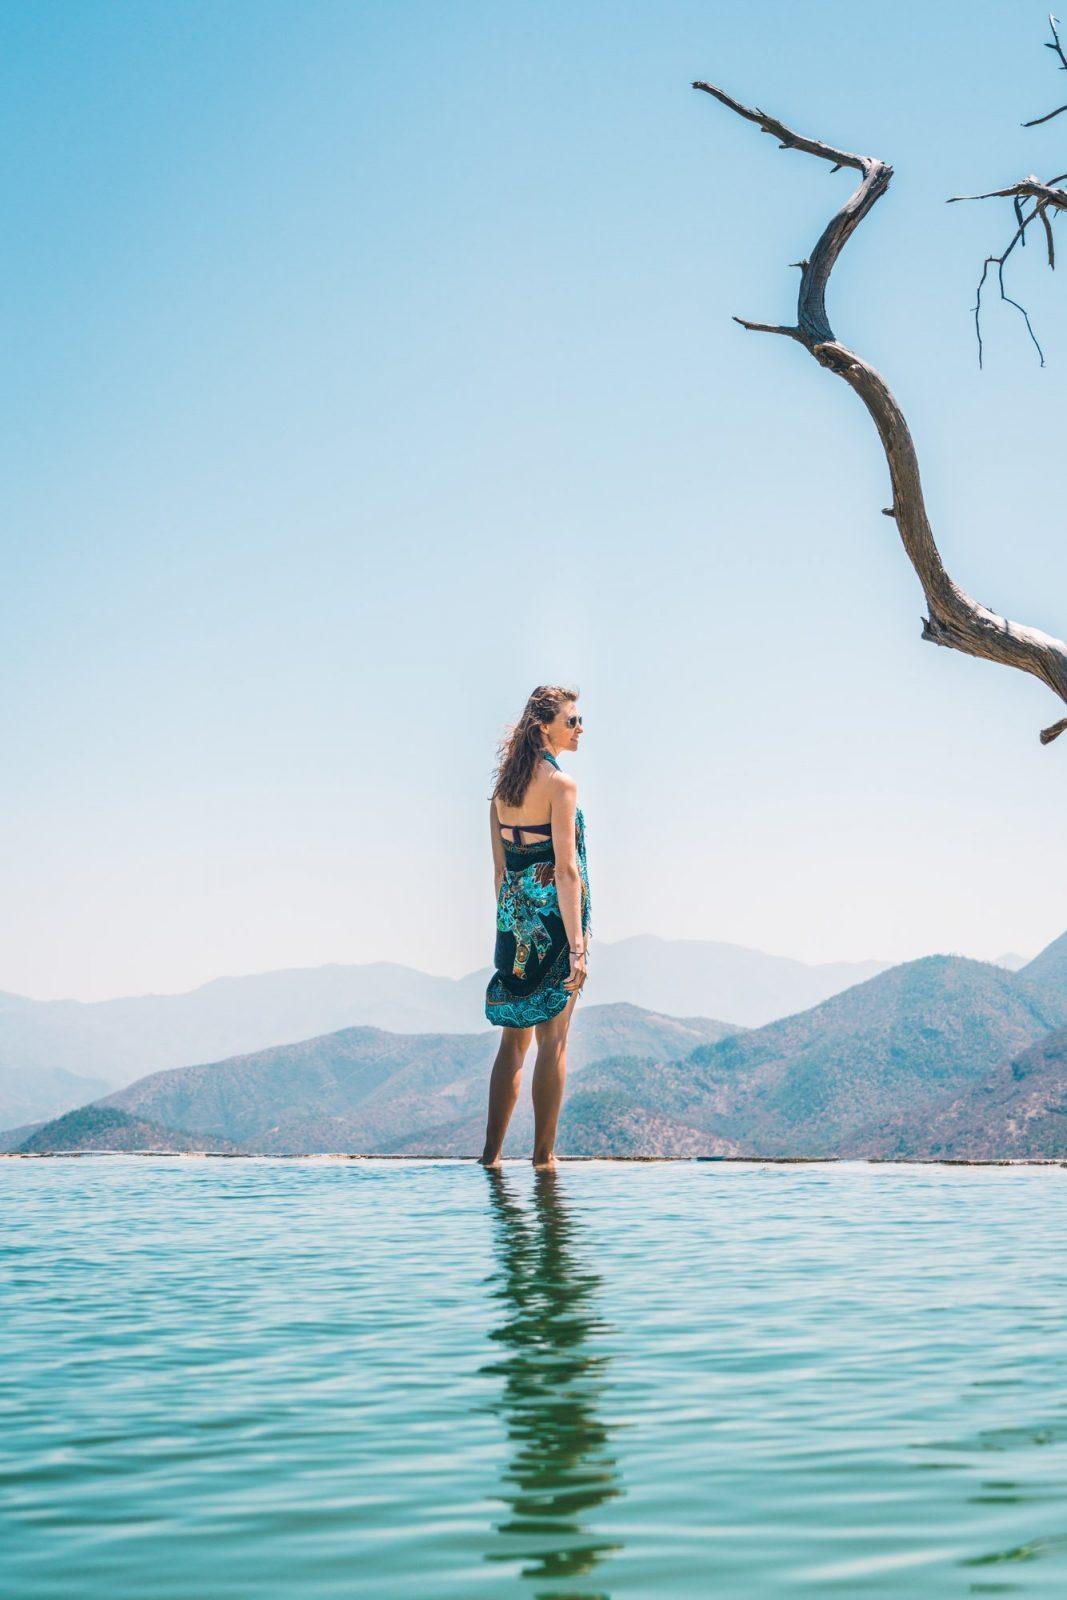 How to Visit Hierve el Agua near Oaxaca, Mexico